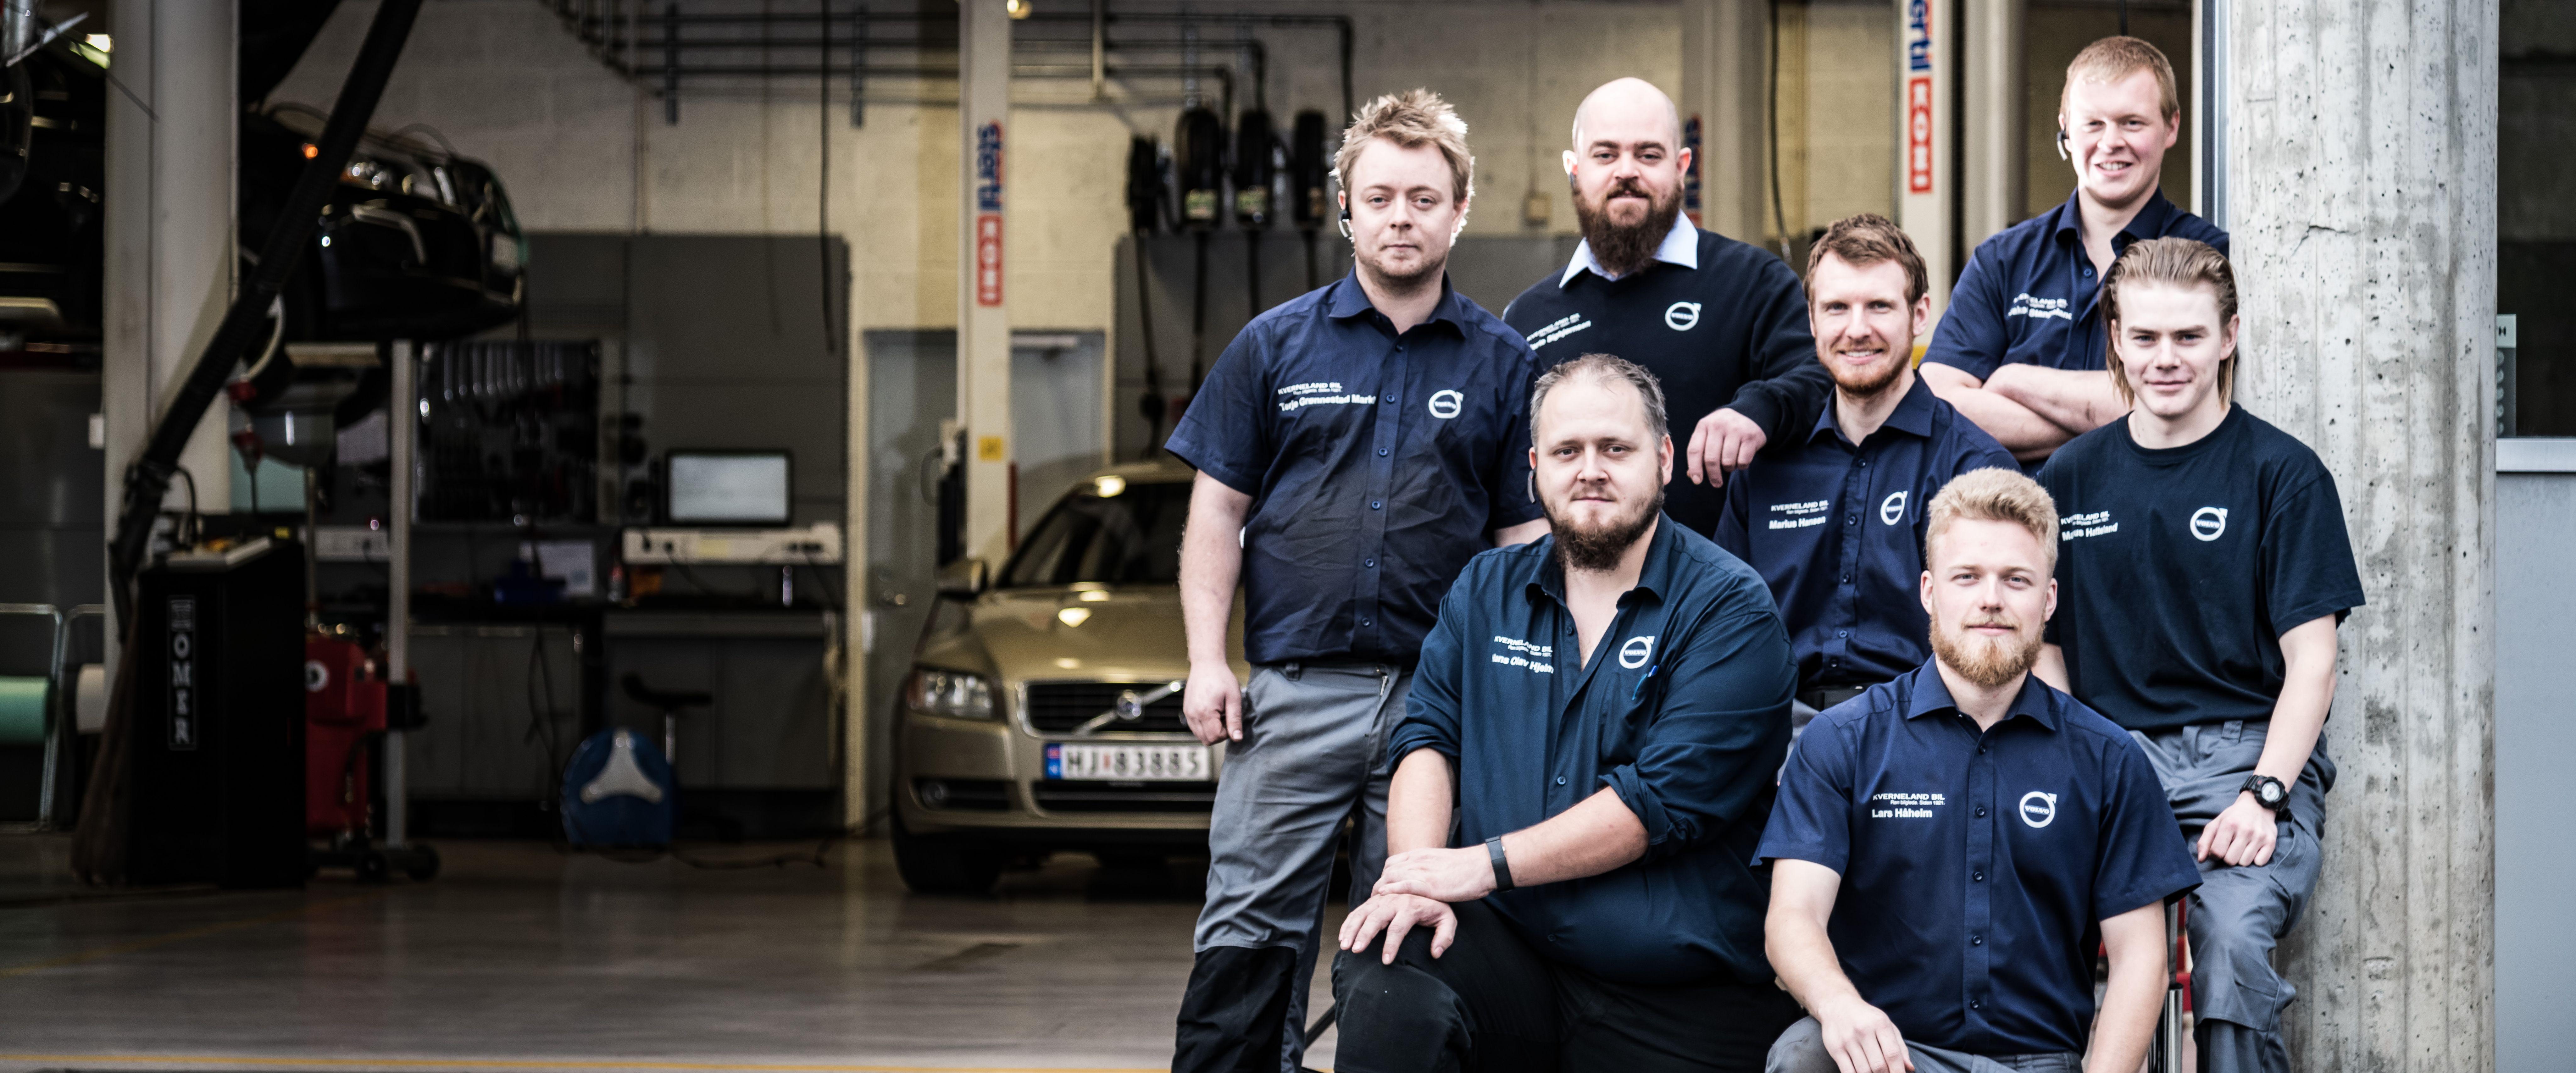 De ansatte på Kverneland Bil | Mariero